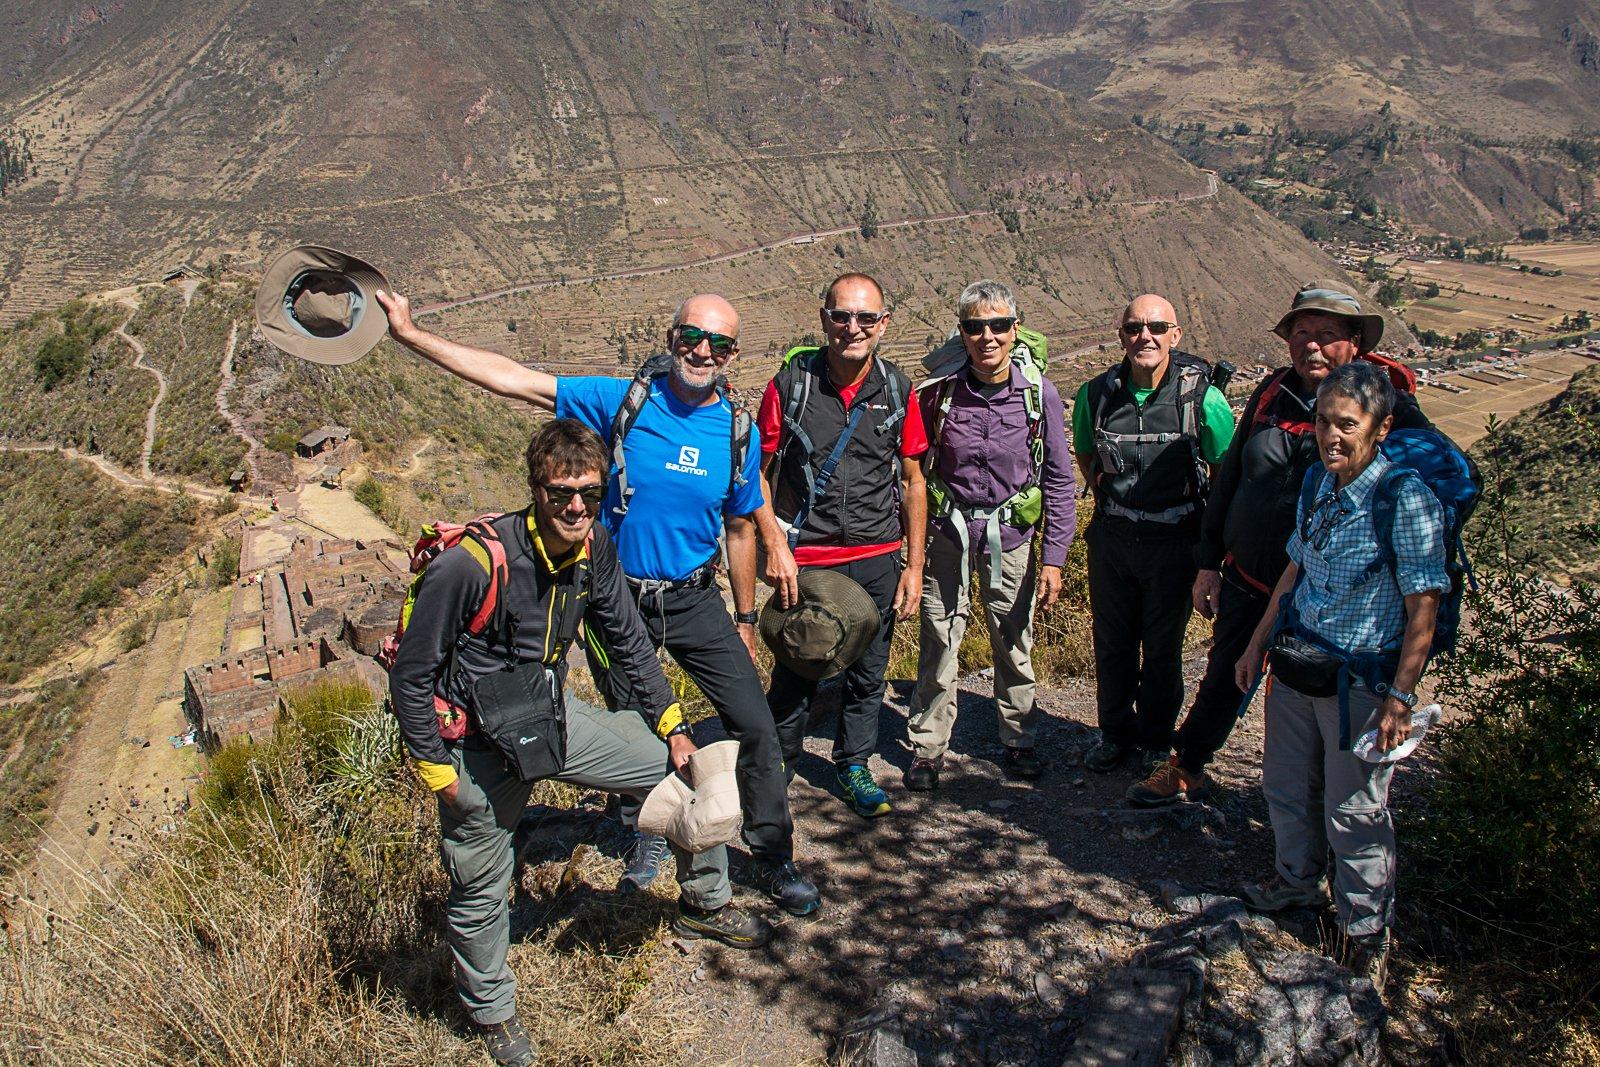 viaggio-trekking-perù-gruppo-valle-sacra-cusco